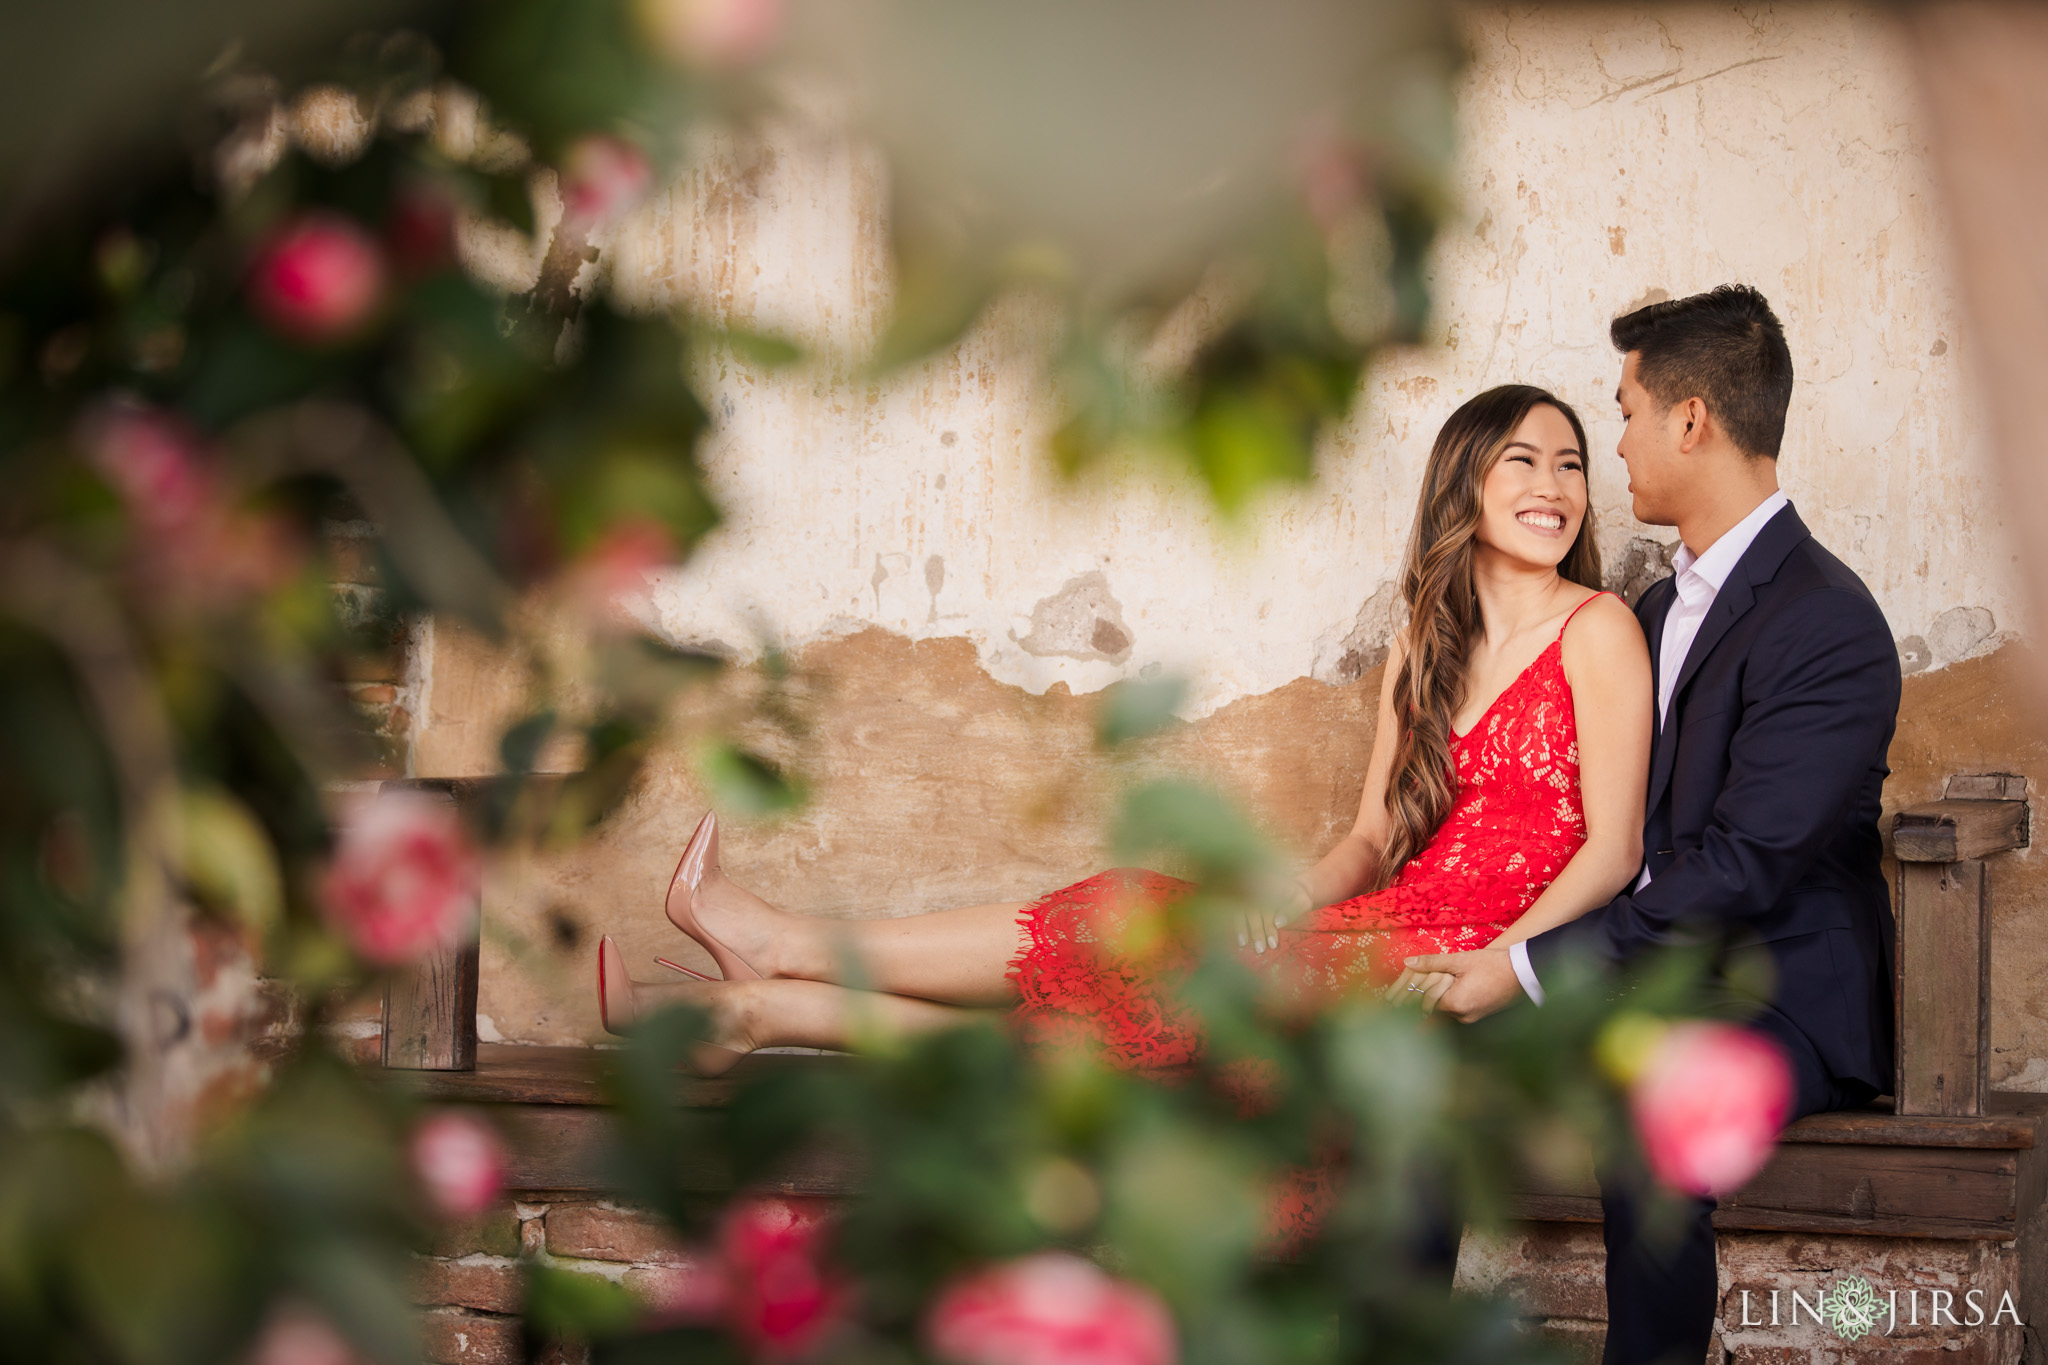 10 mission san juan capistrano engagement photographer